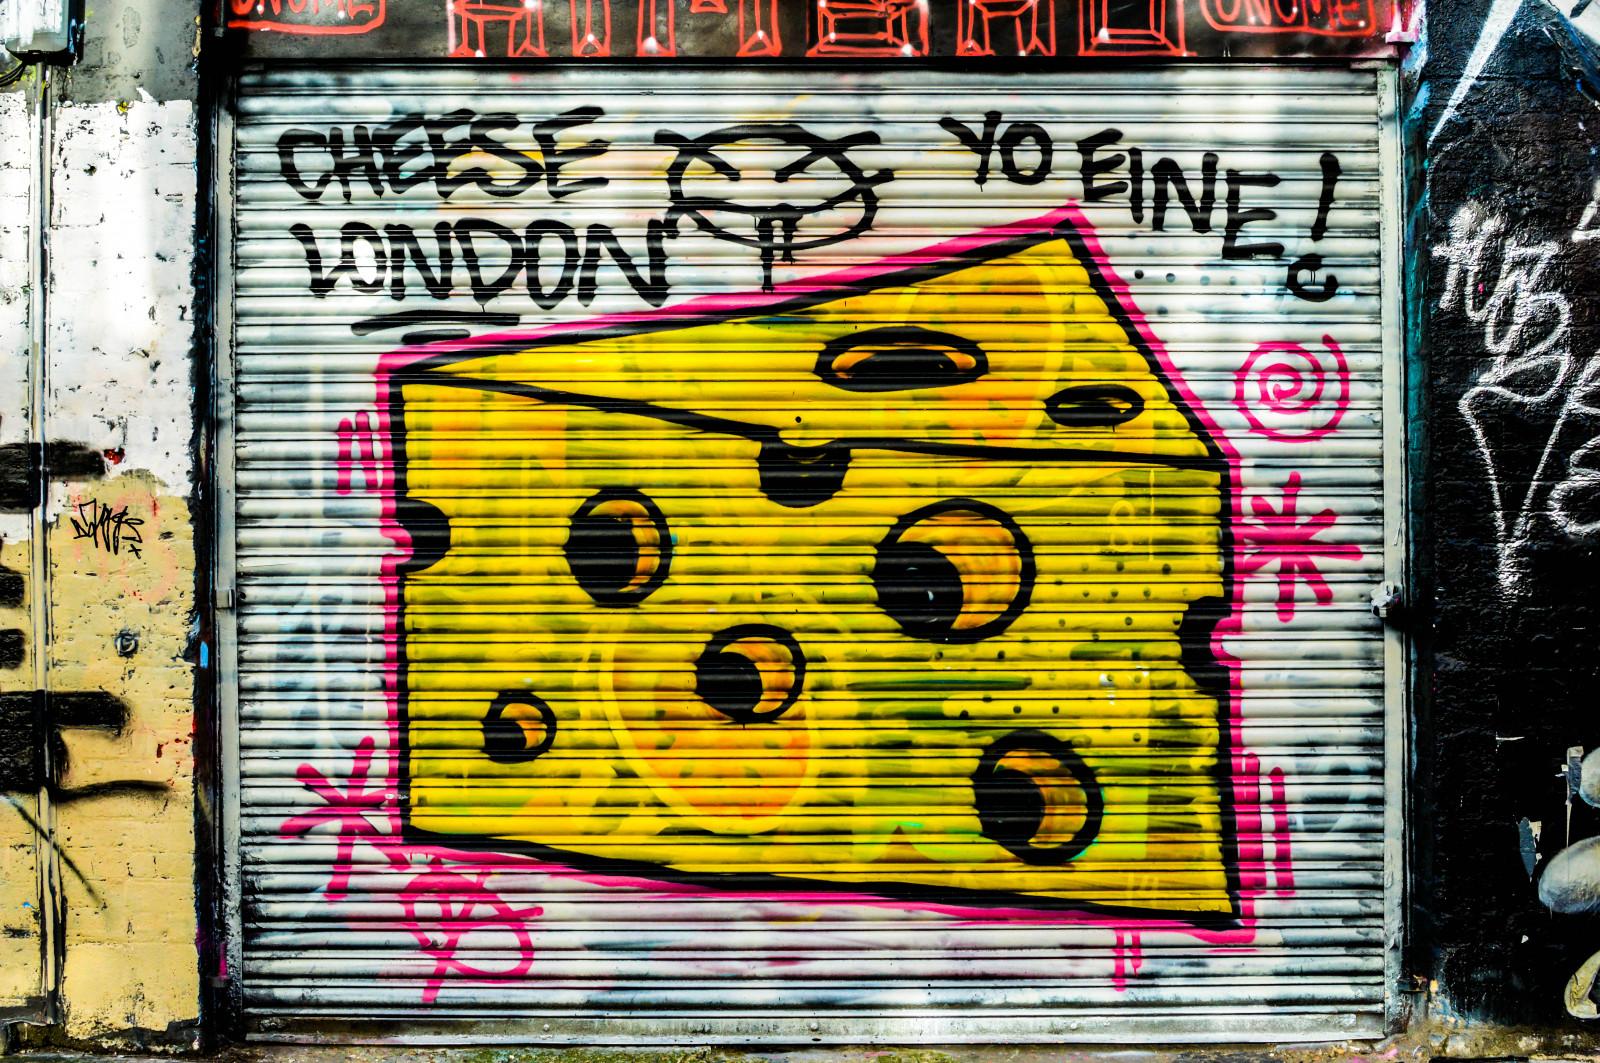 Wallpaper : London, abstract, wall, cheese, yellow, triangle, Nikon ...